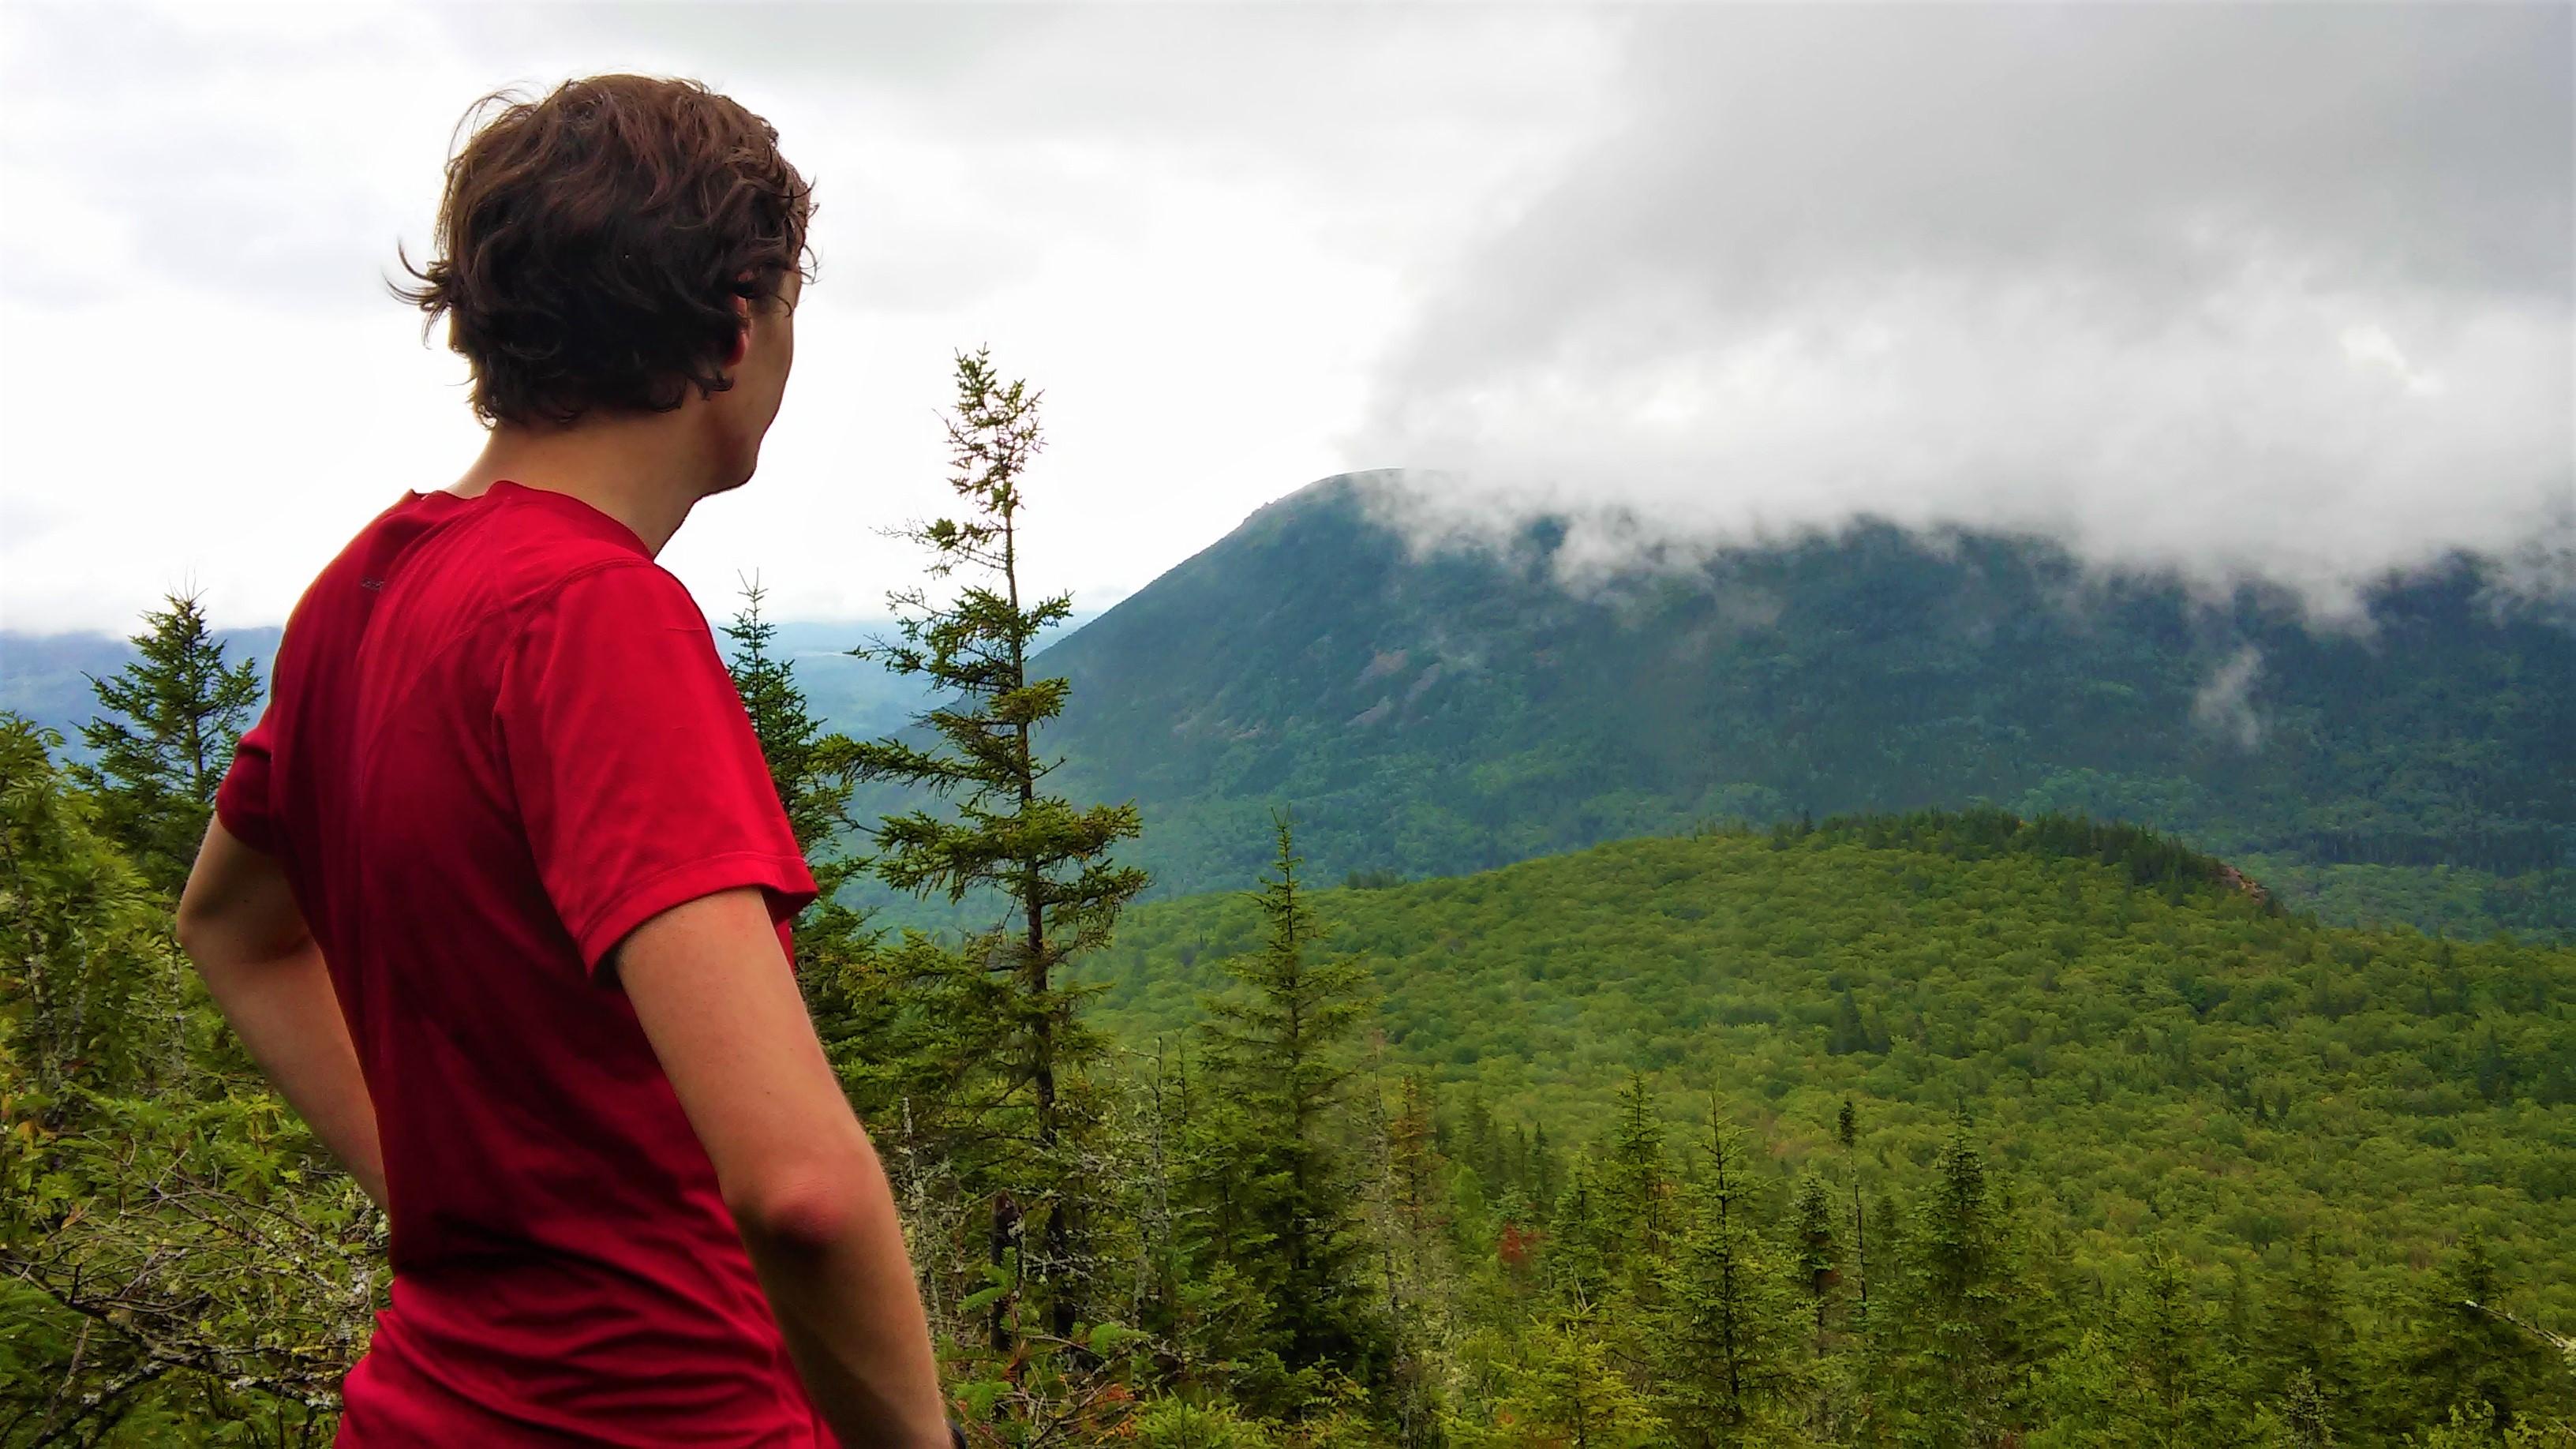 blog voyage arpenter le chemin mont carleton nouveau-brunswick acadie canada randonnee